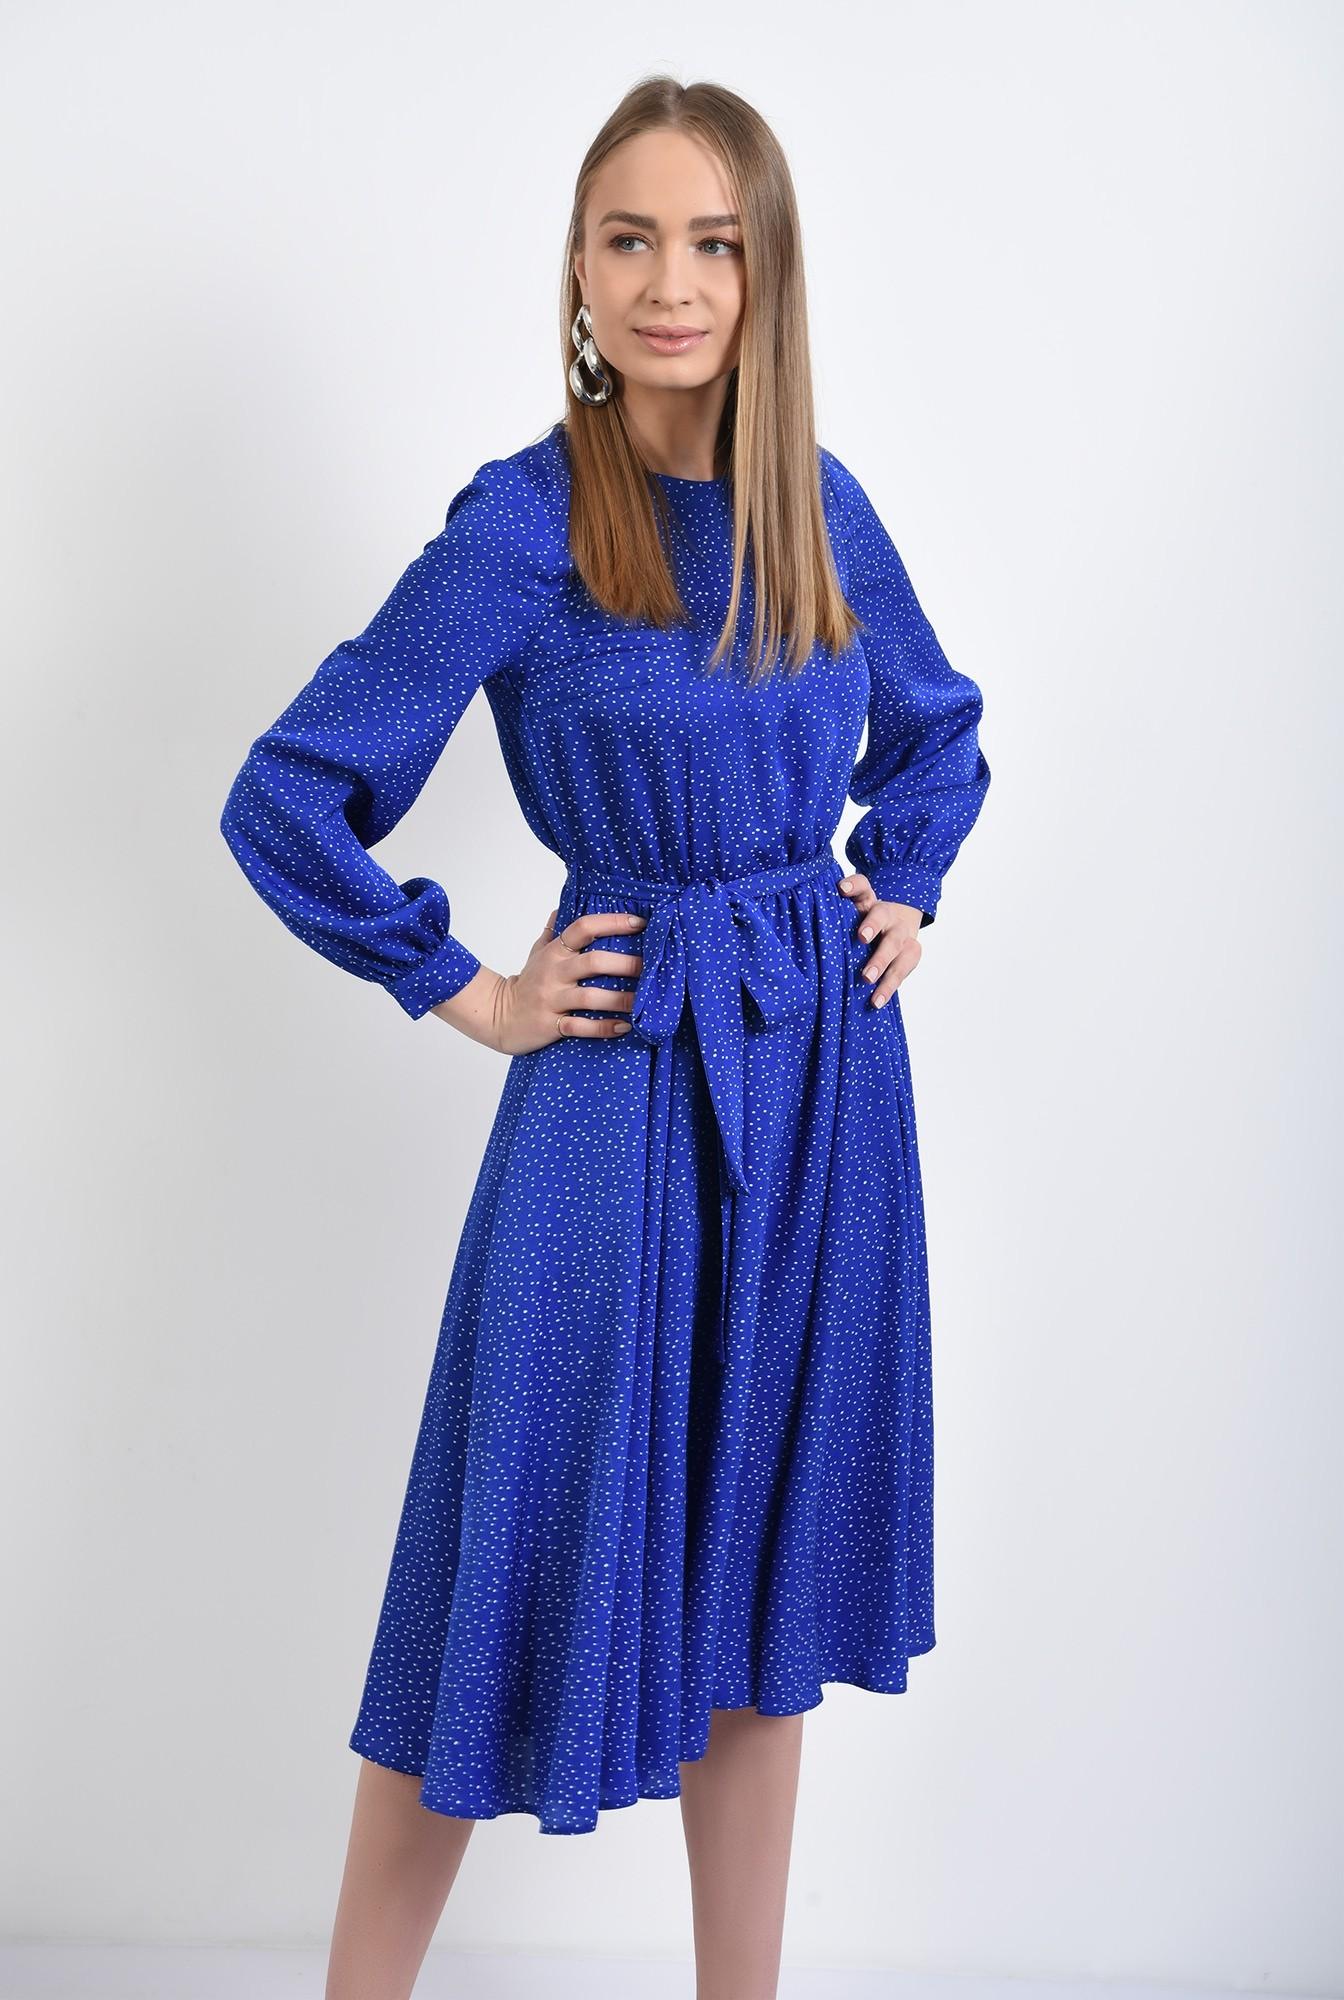 0 - 360 - rochie midi, clos, cu buline, cu nasturi la spate, rochie de primavara